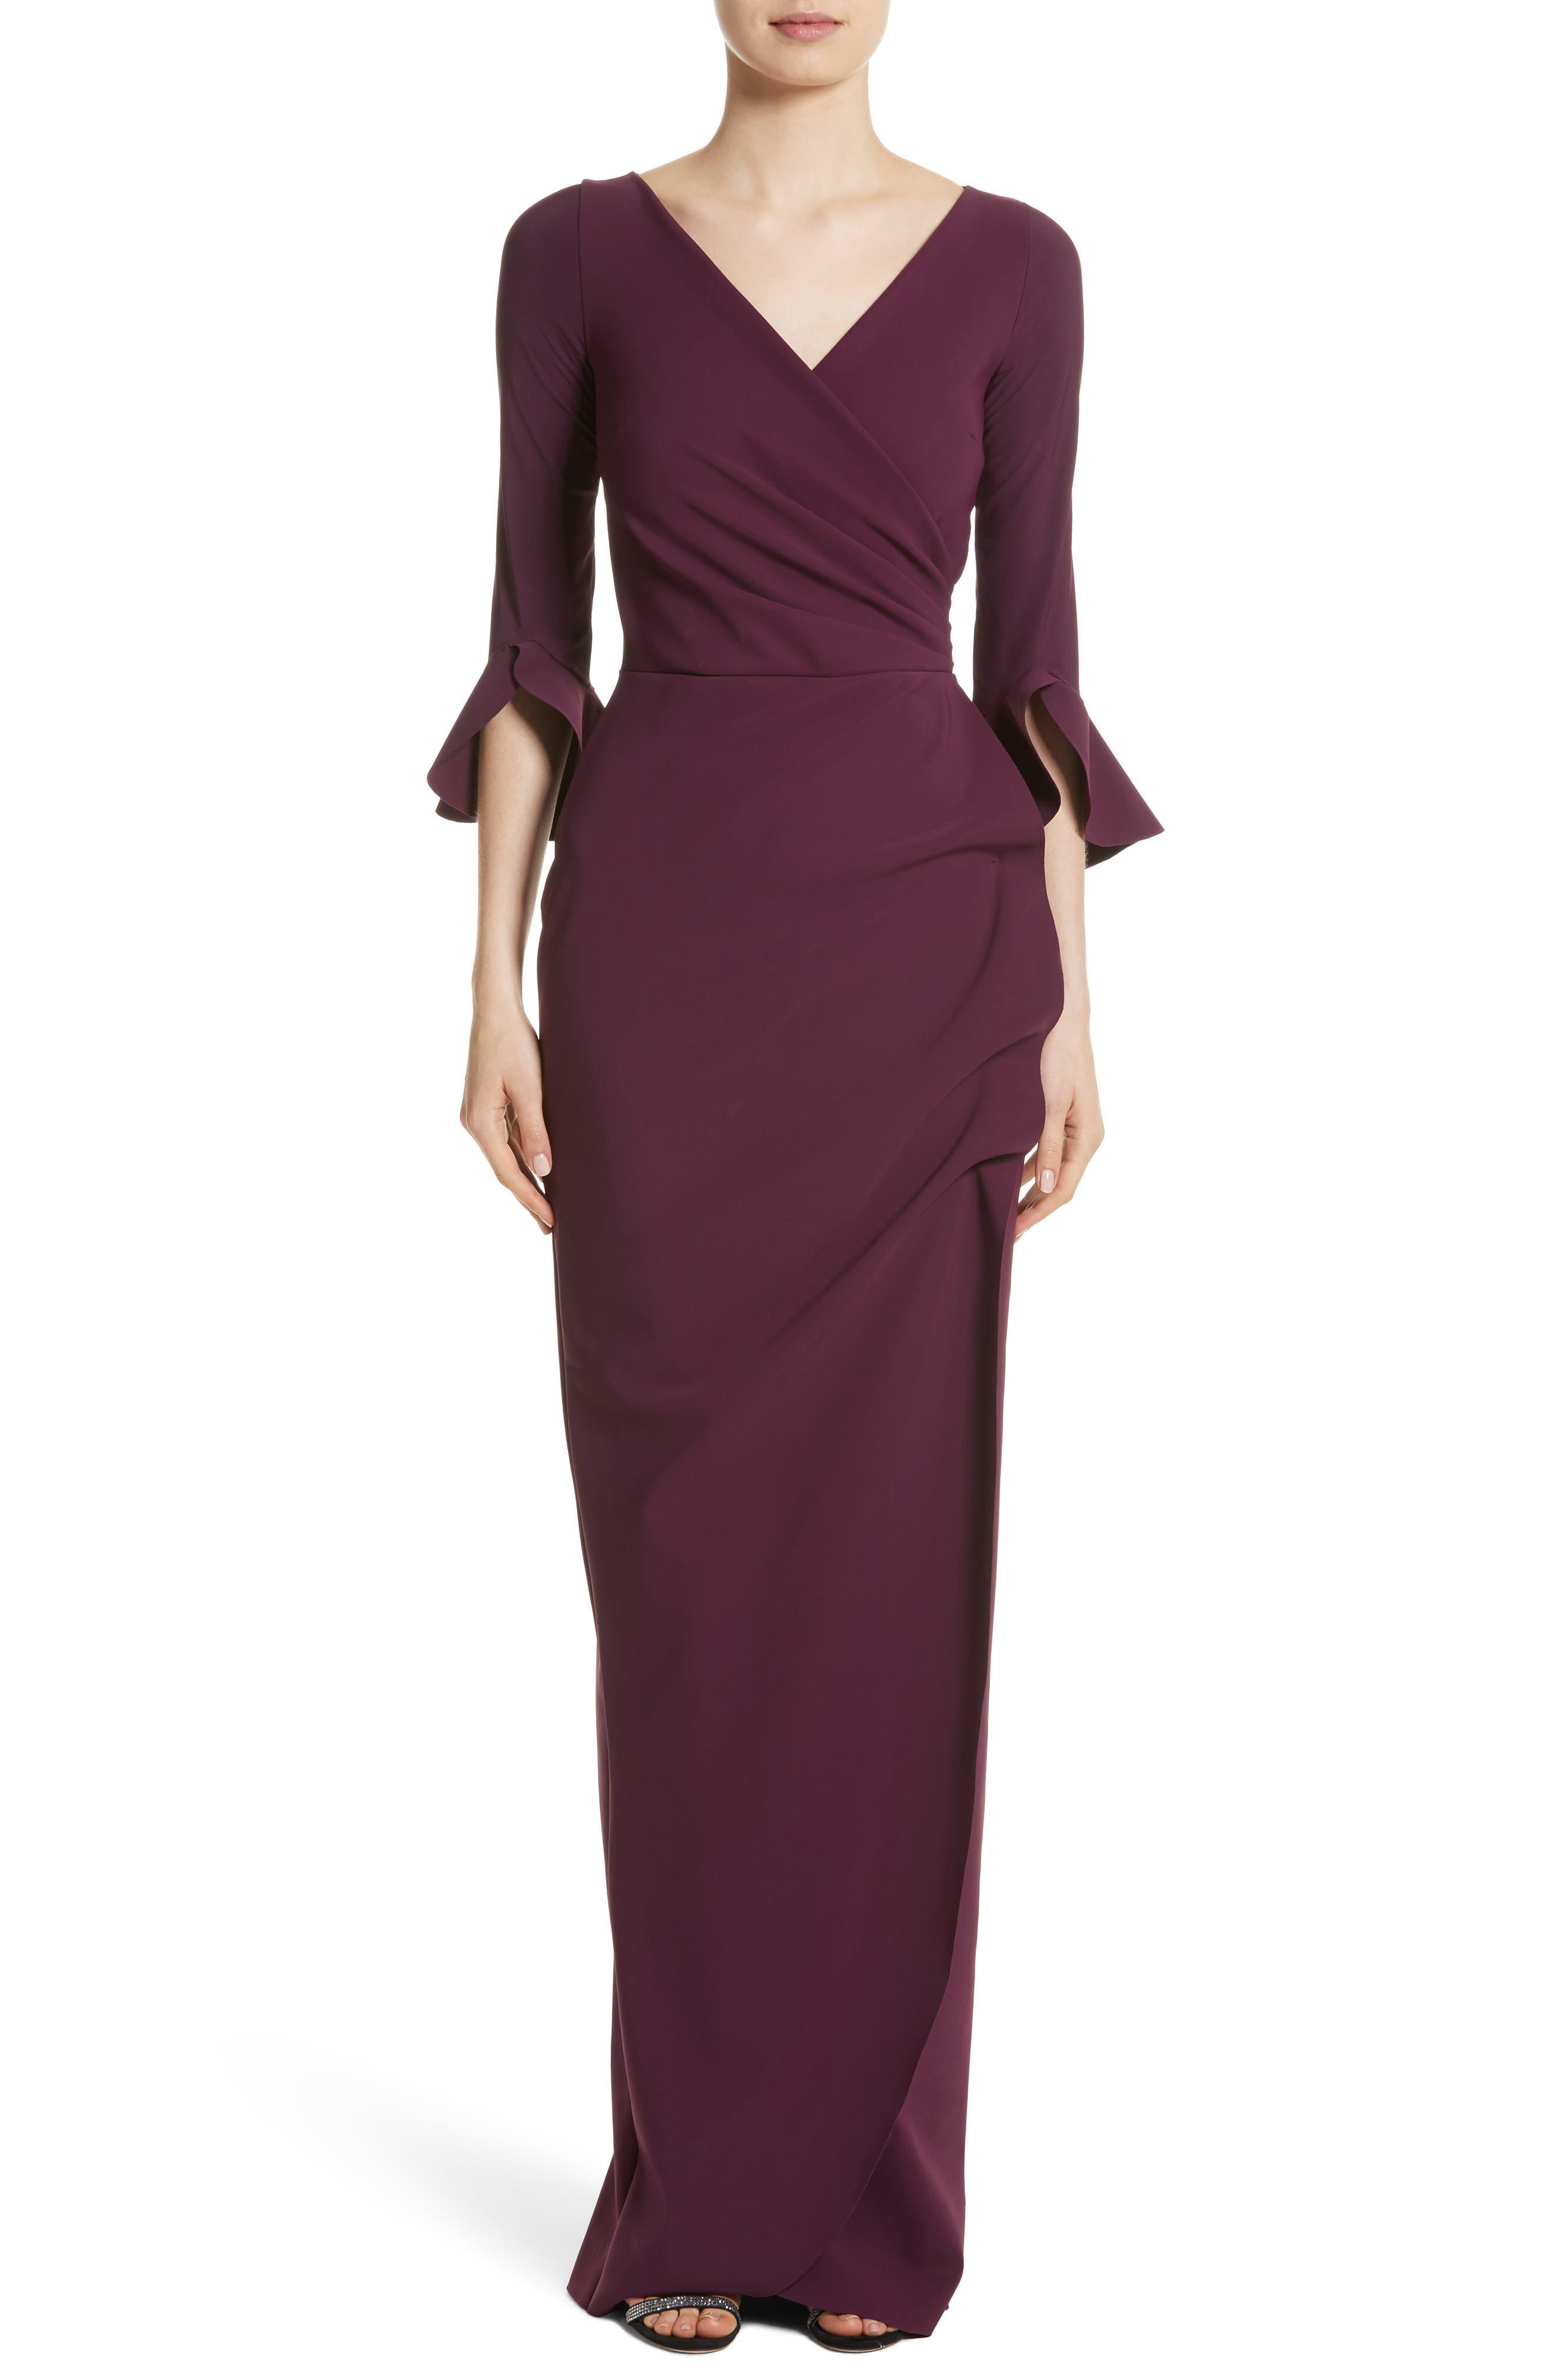 Chiara Boni La Petite Robe Ruched Bell Sleeve Evening Dress